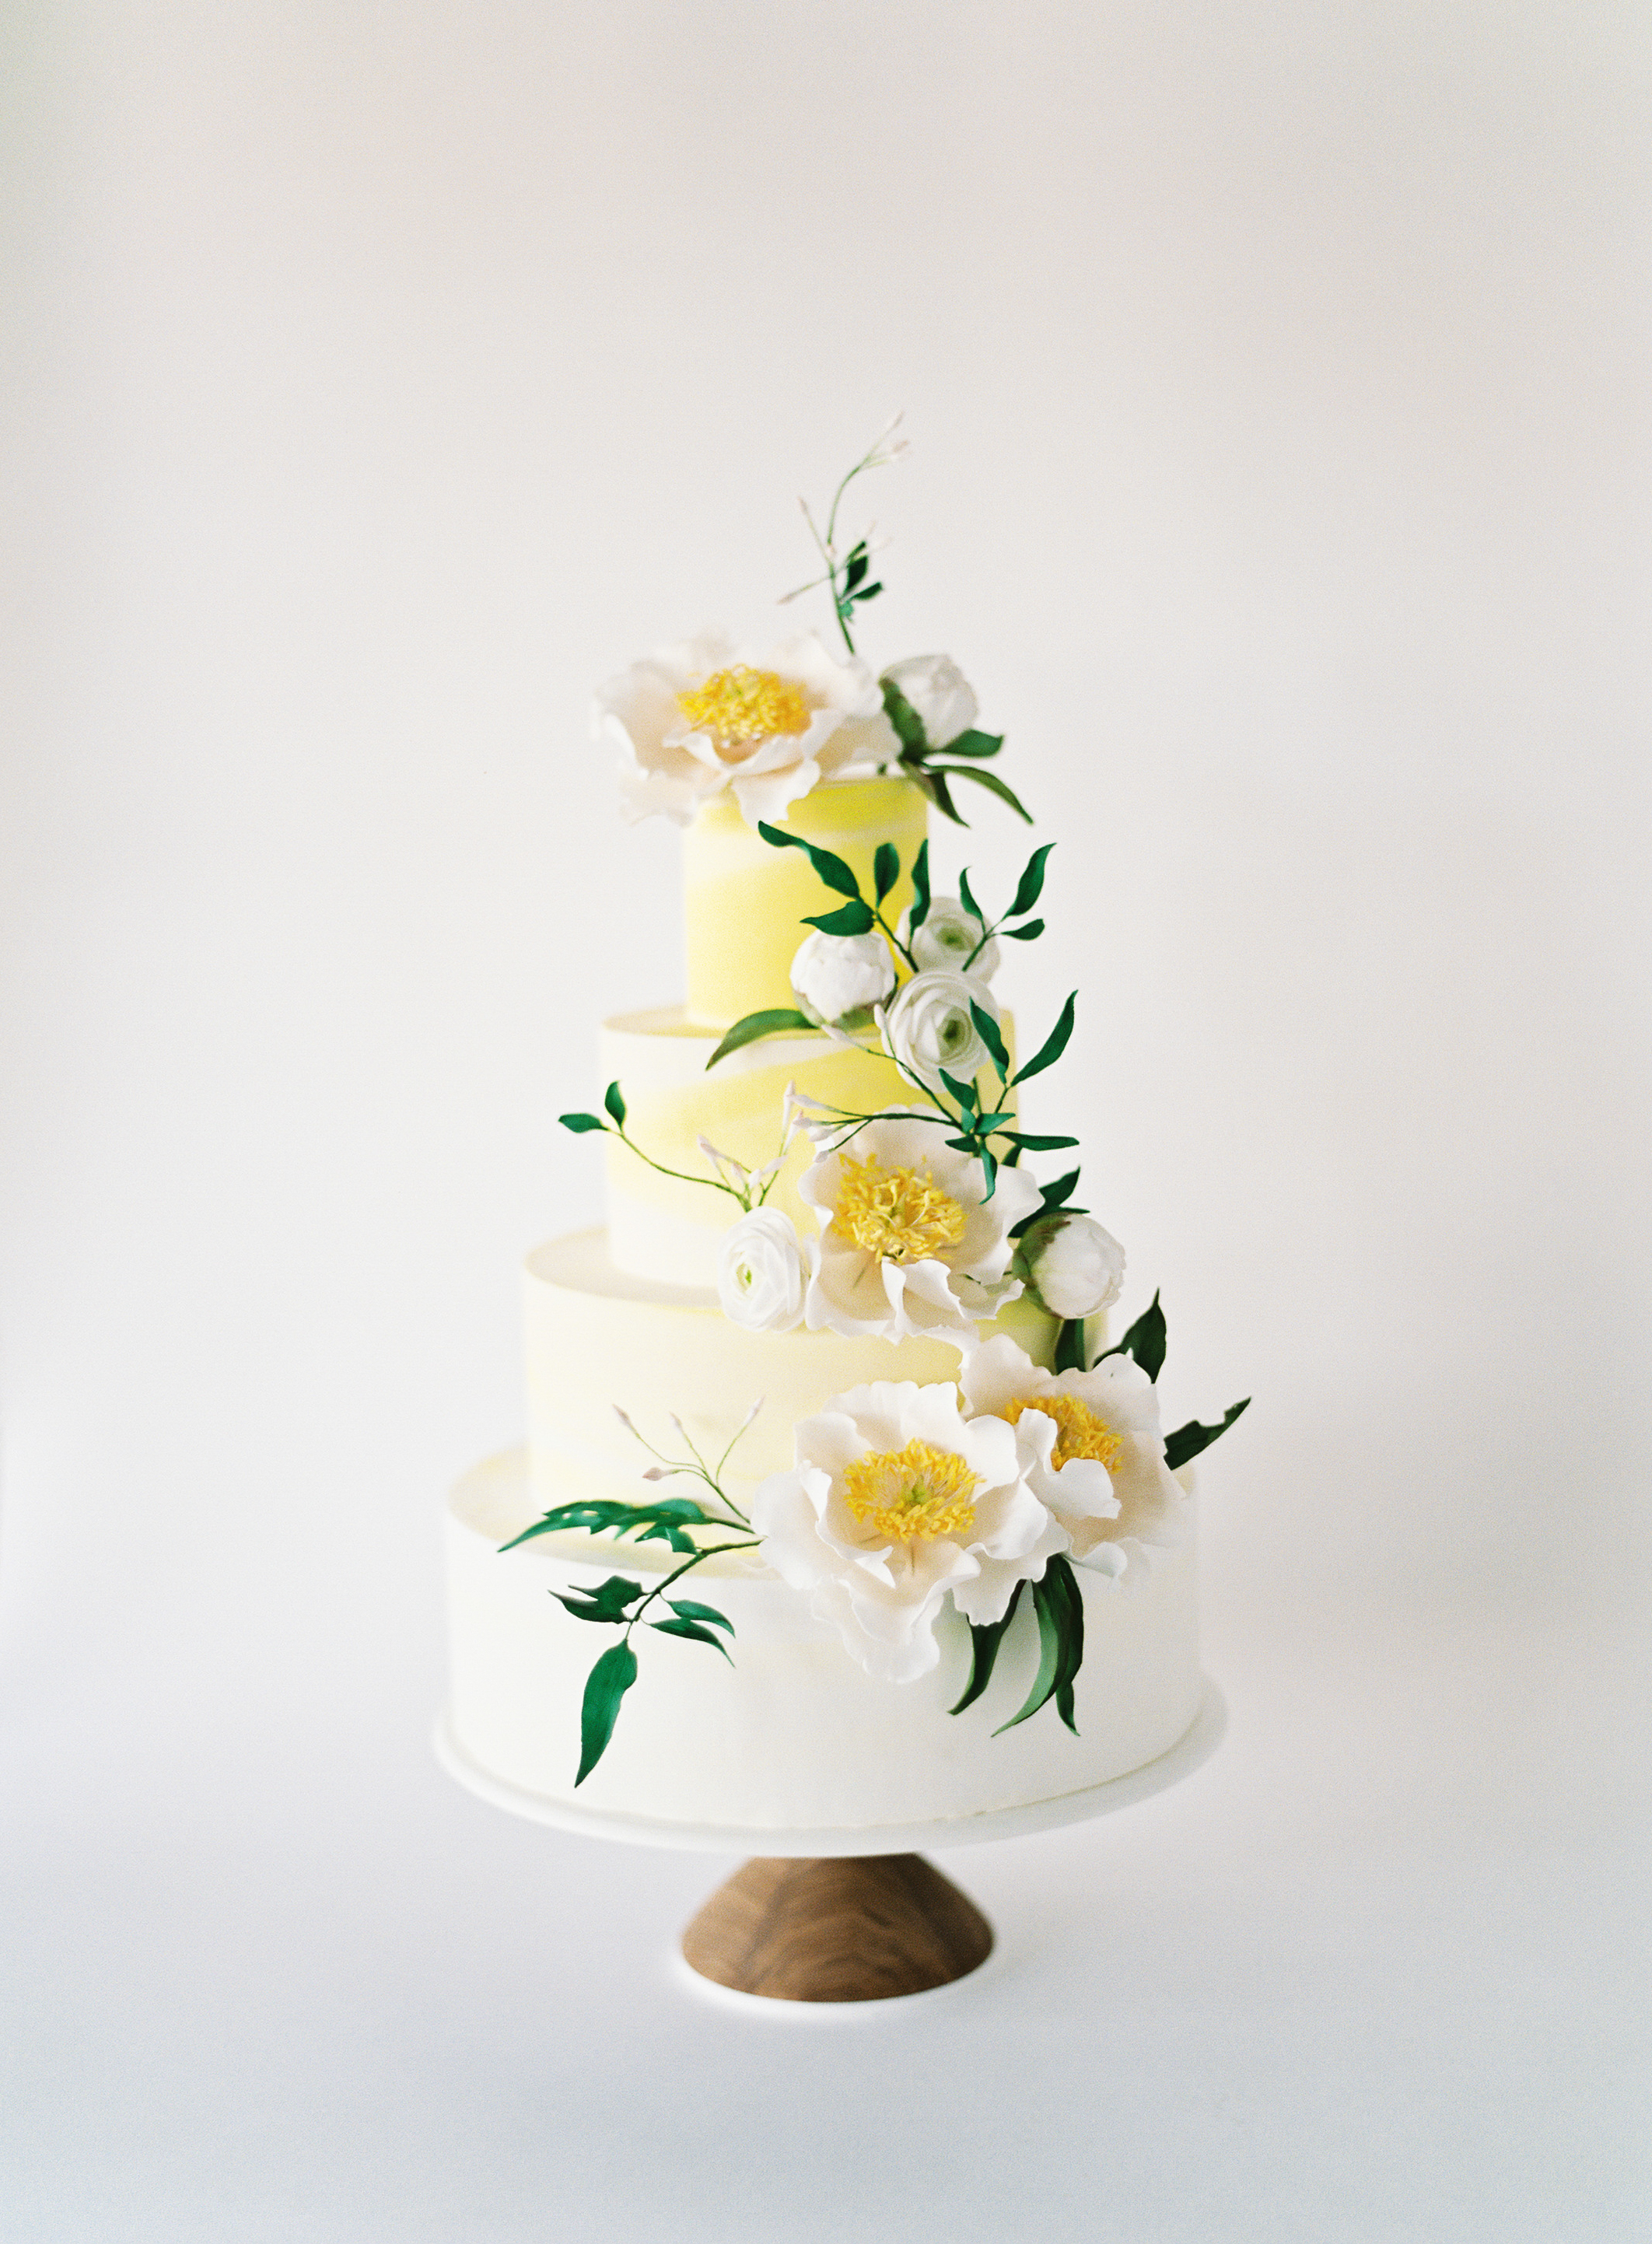 Yellow Color-Wash Wedding Cake, Fall Wedding Cake Trends